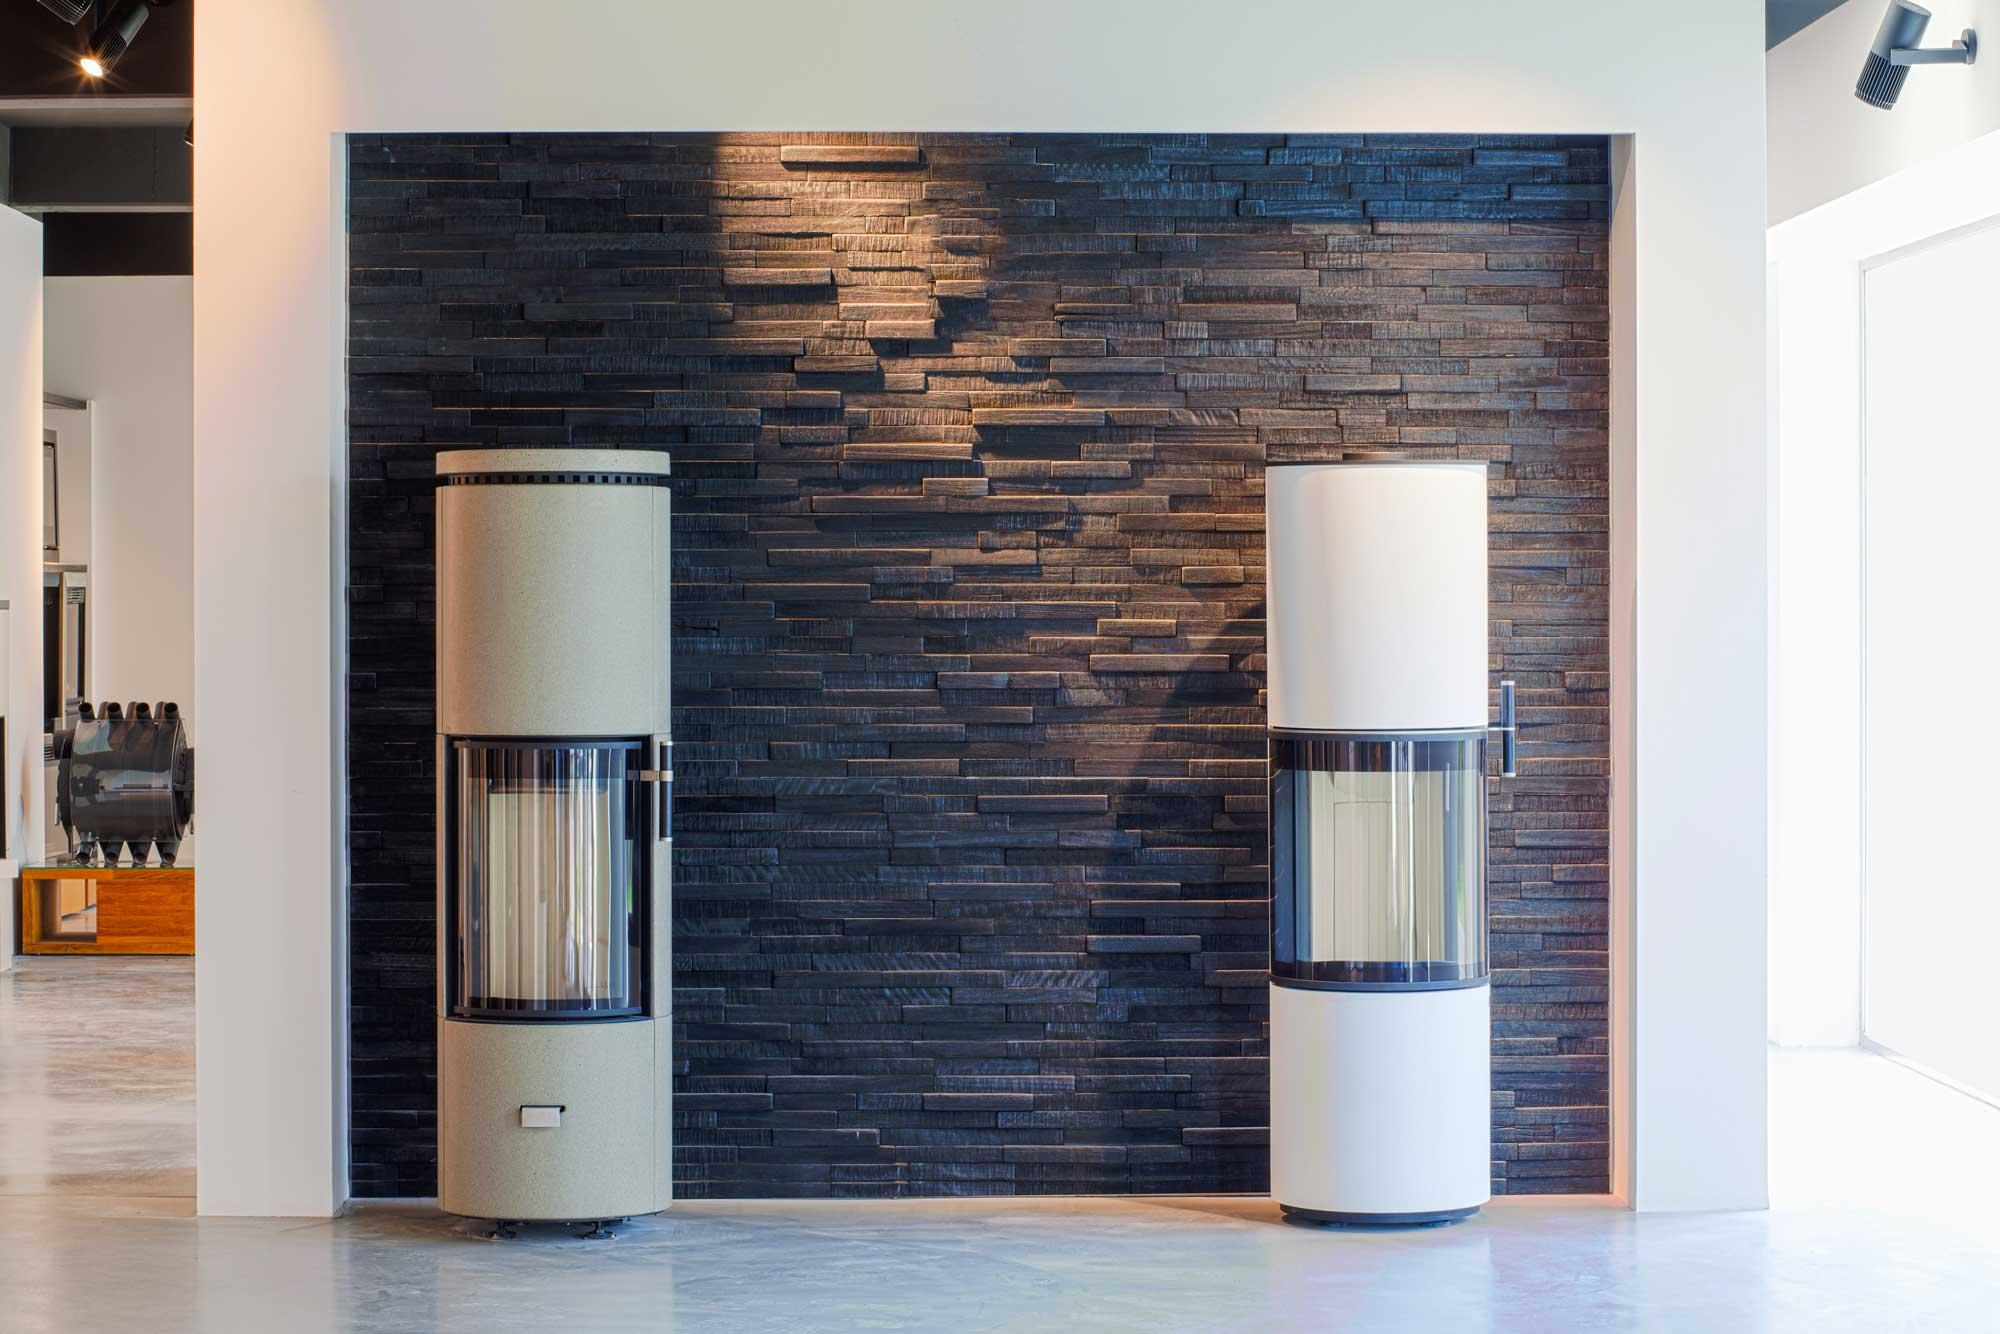 Wandgestalltung-kaminbau-wandpaneele-1